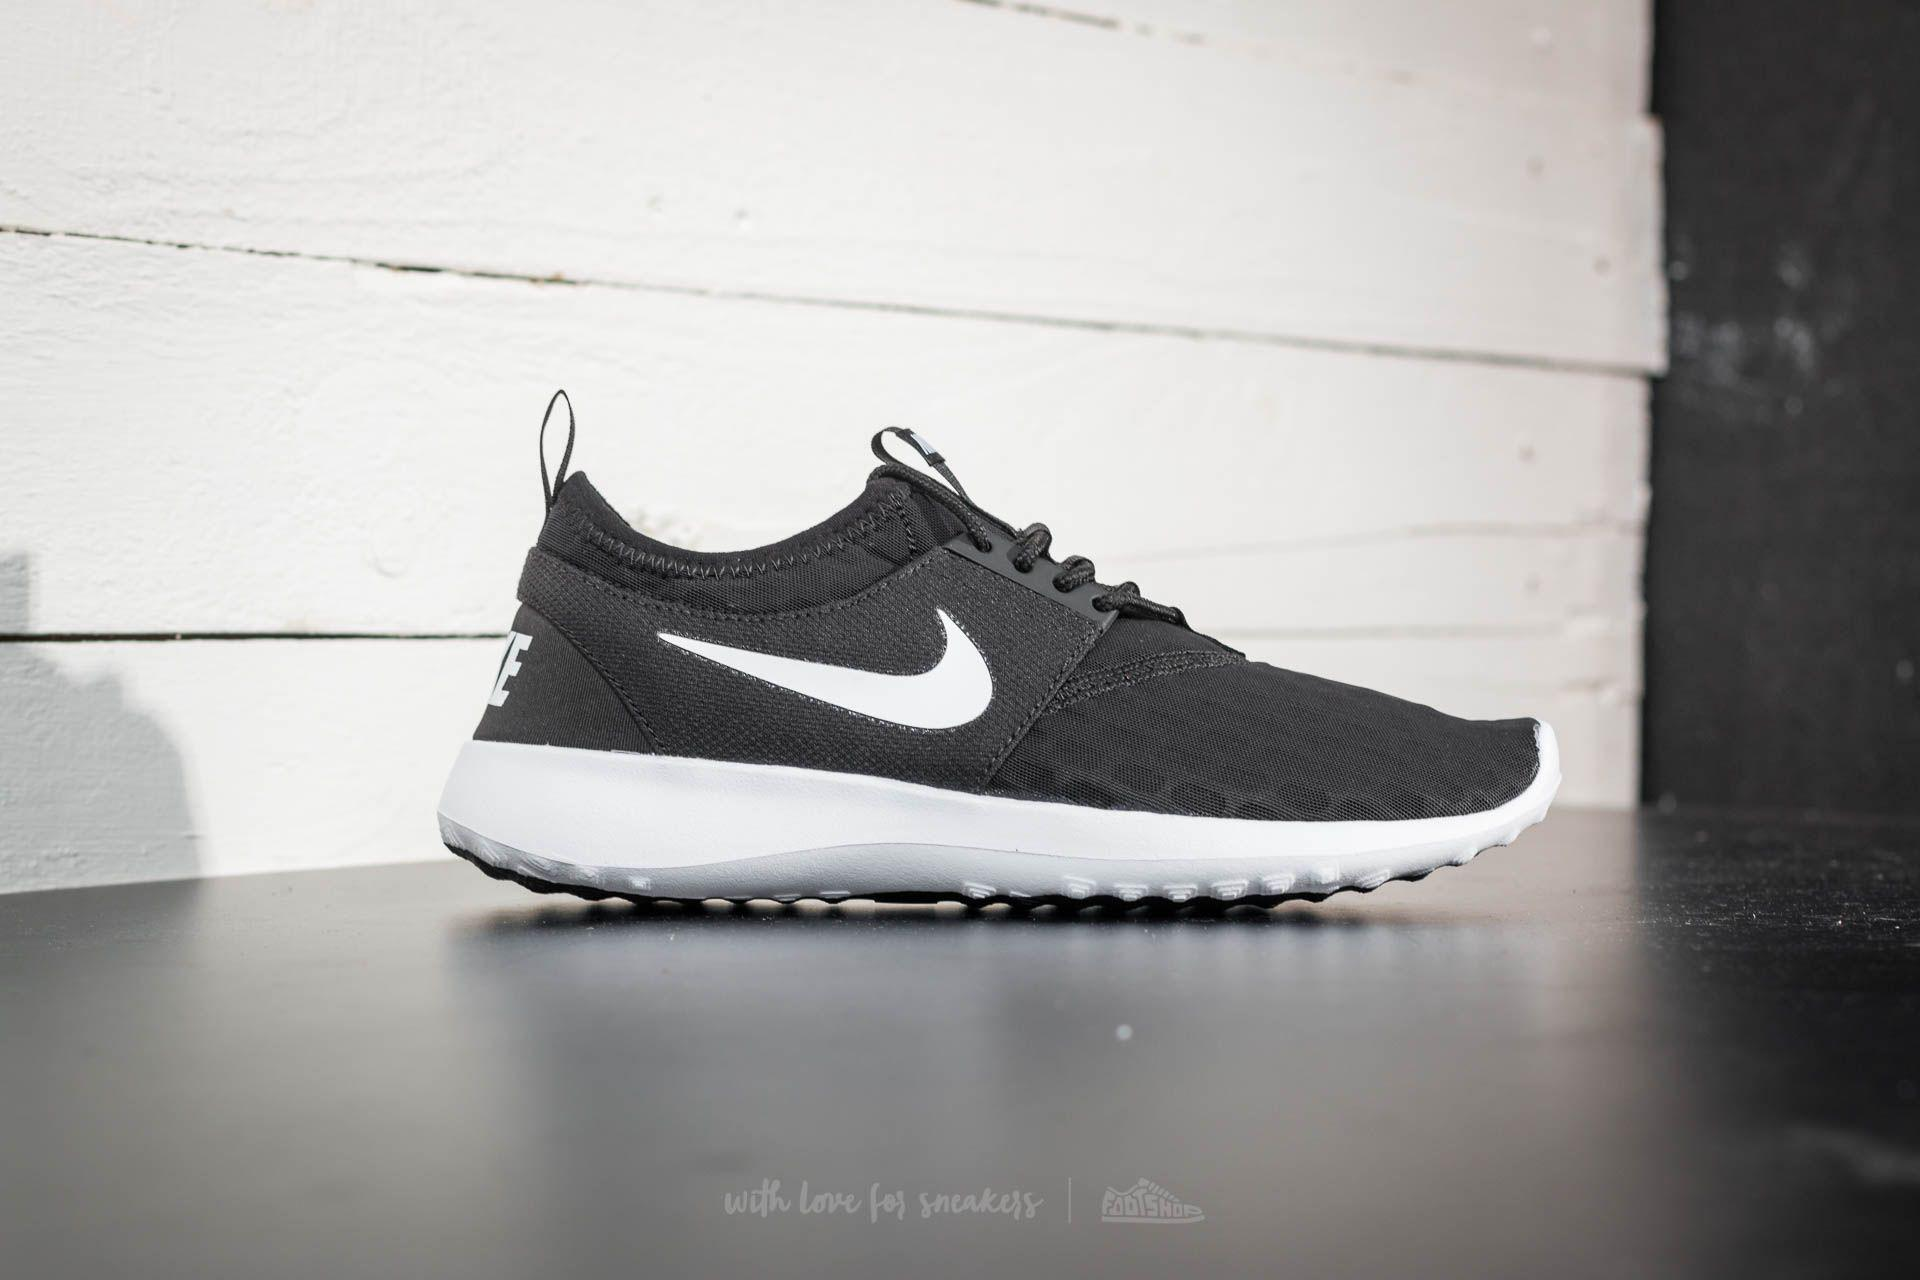 05925181512a2 Lyst - Nike Wmns Juvenate Black  White-black-white in Black